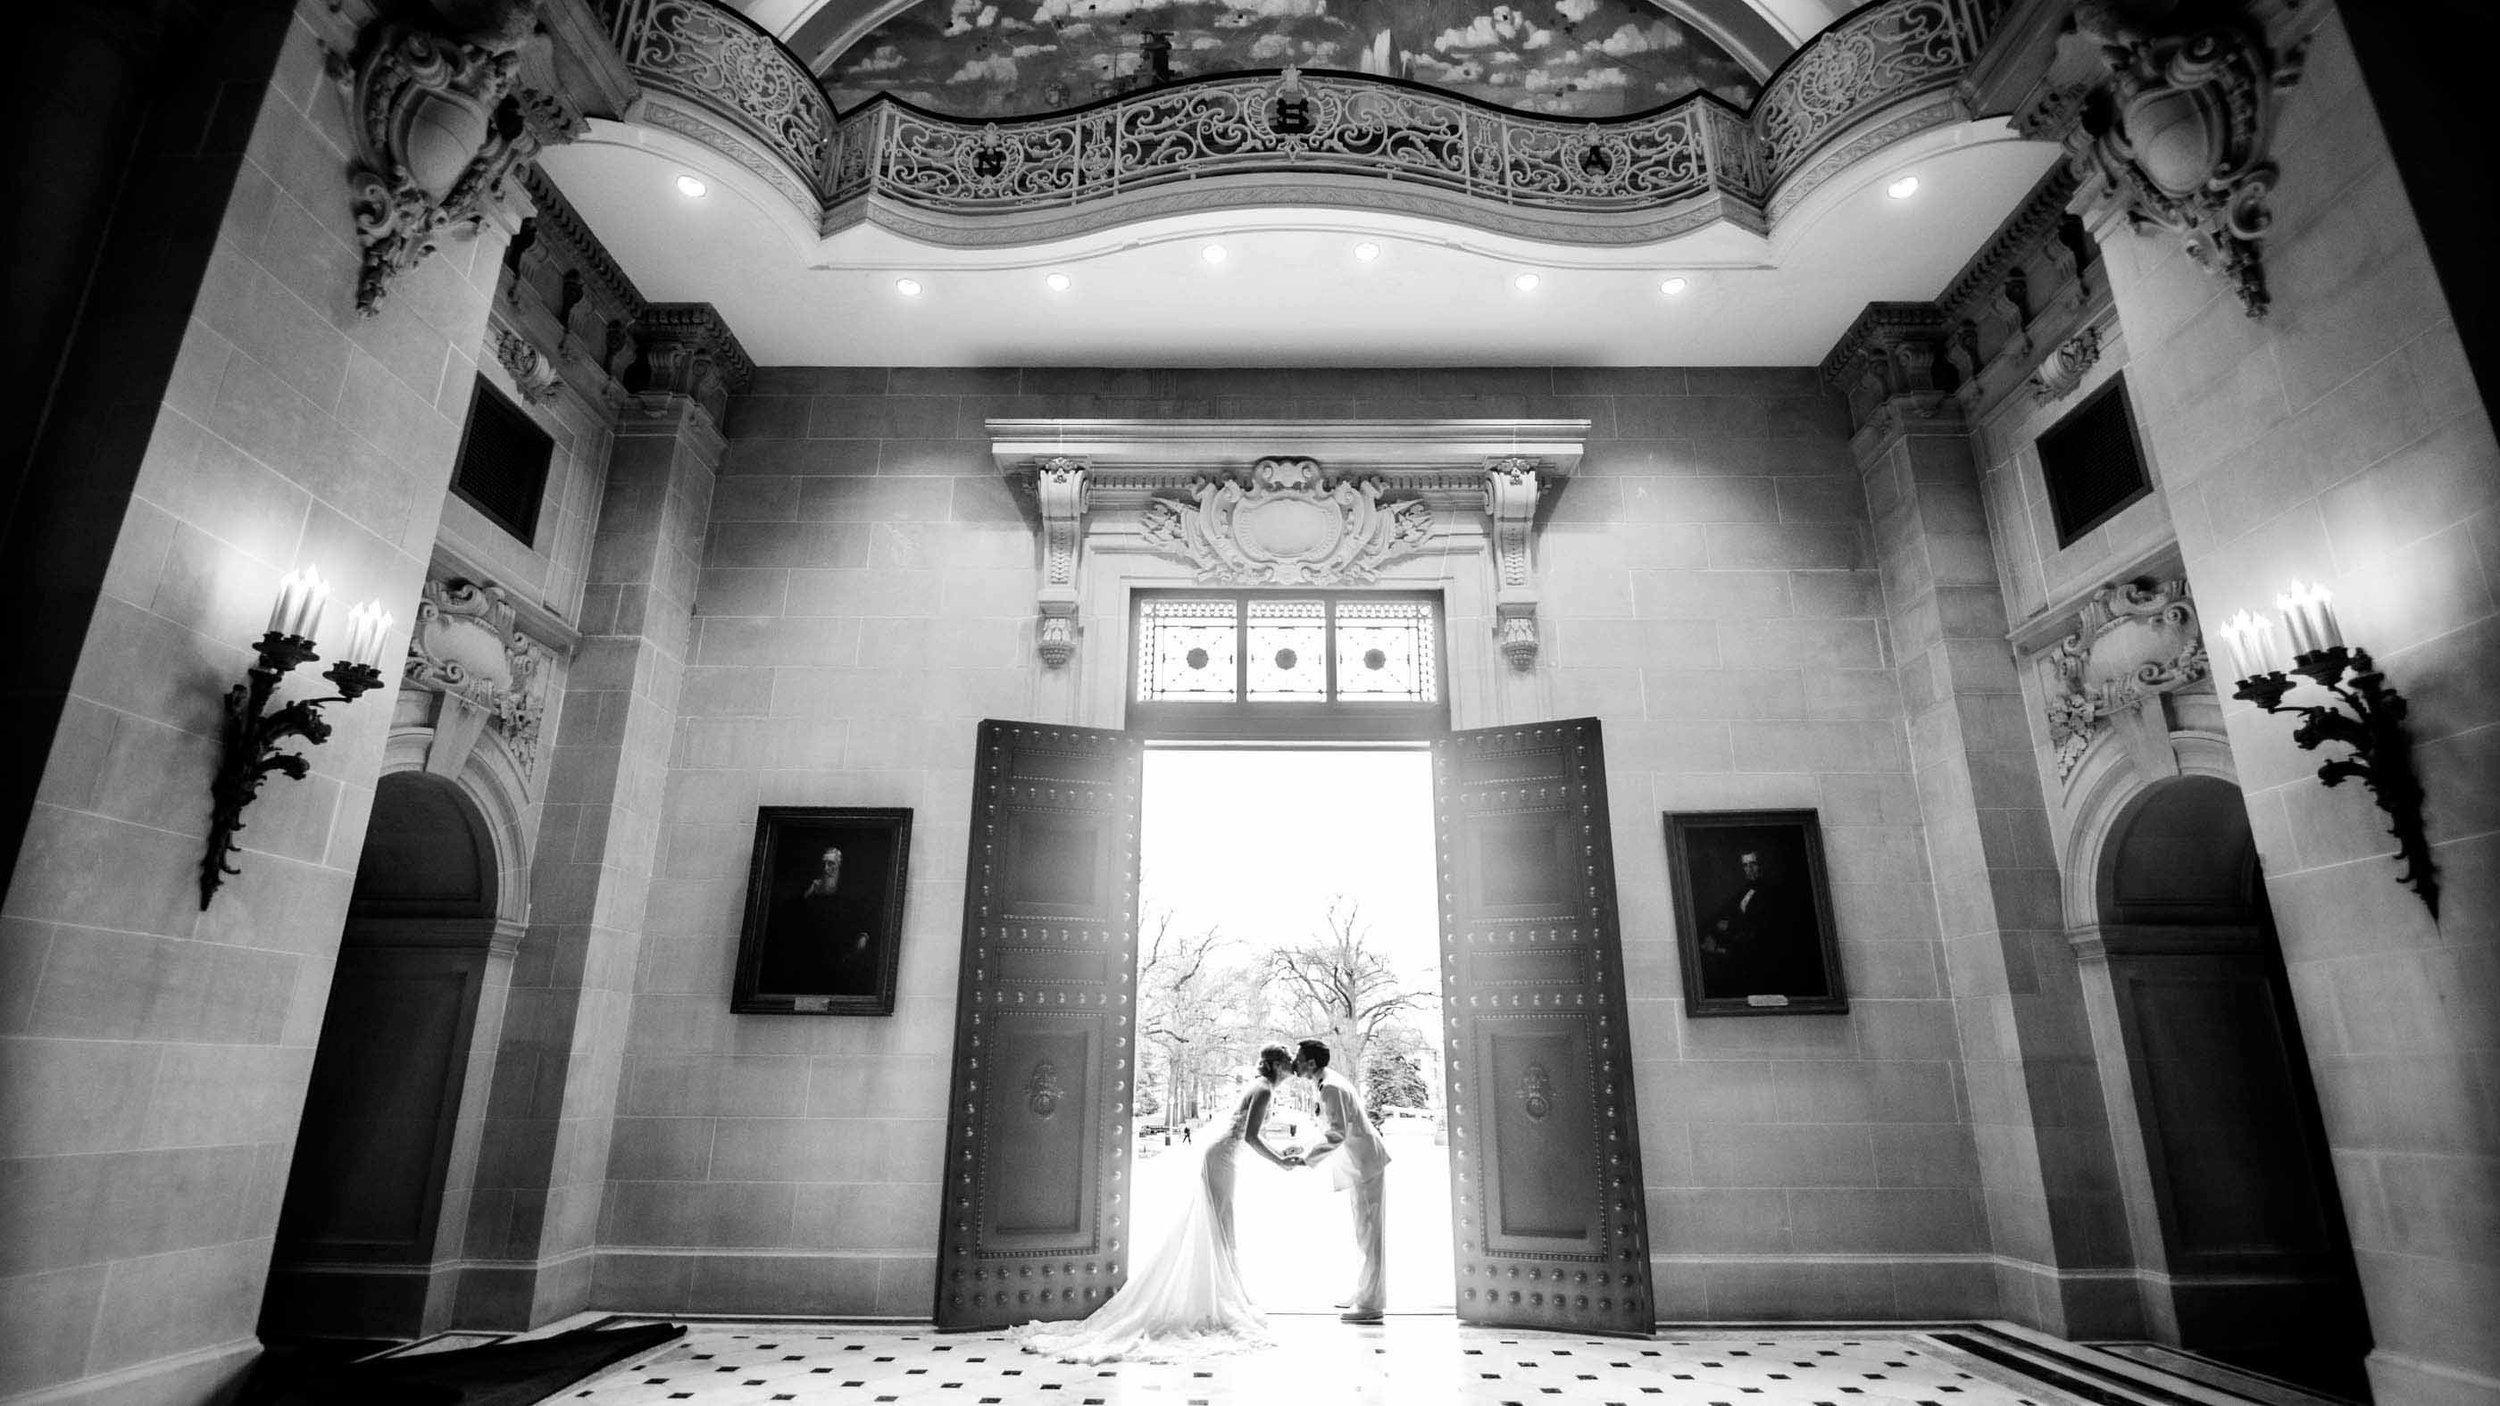 dc+metro+wedding+photography+vadym+guliuk-4563-15-60.jpg